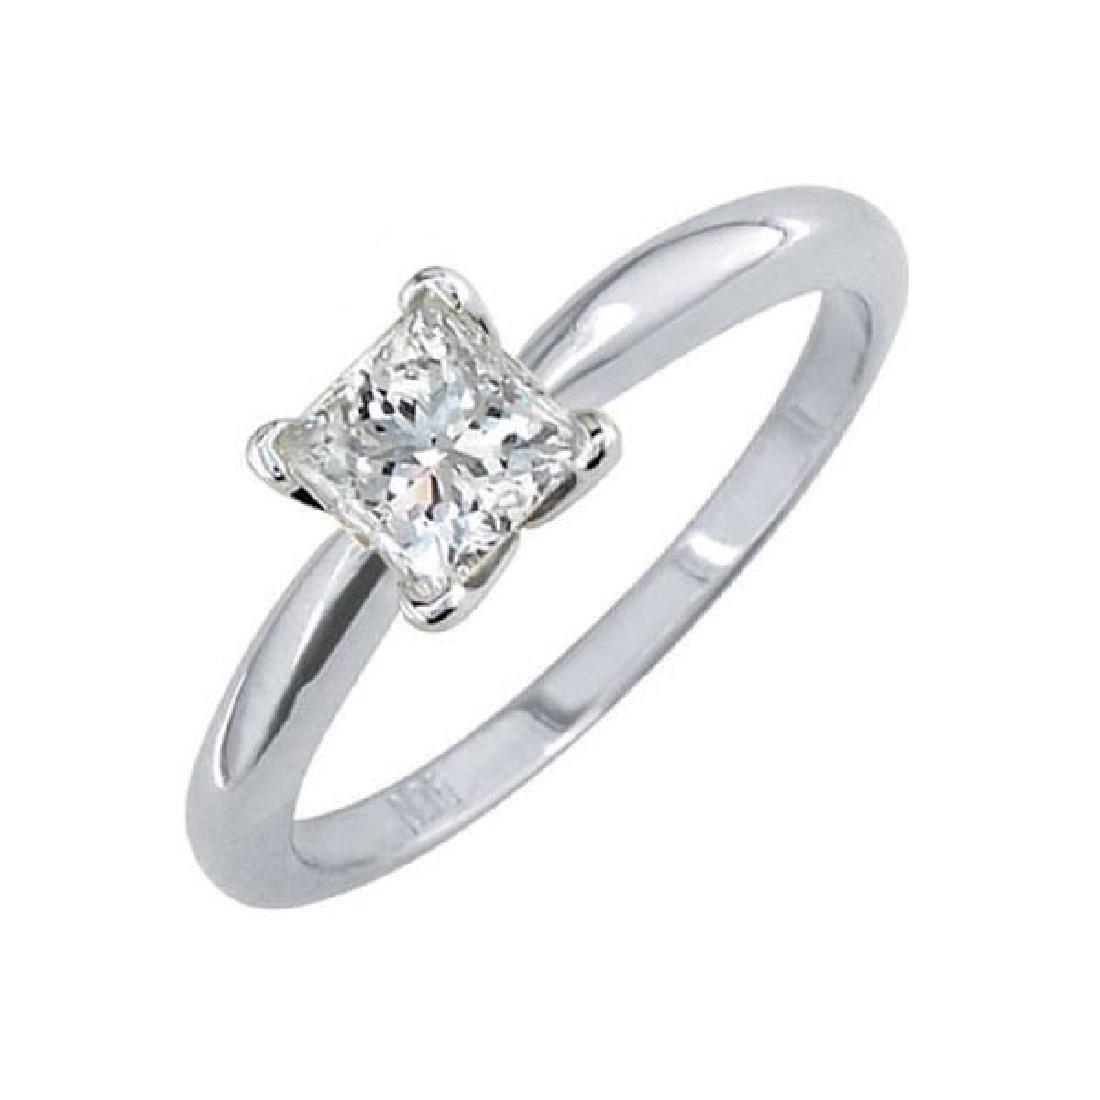 Certified 1.2 CTW Princess Diamond Solitaire 14k Ring F